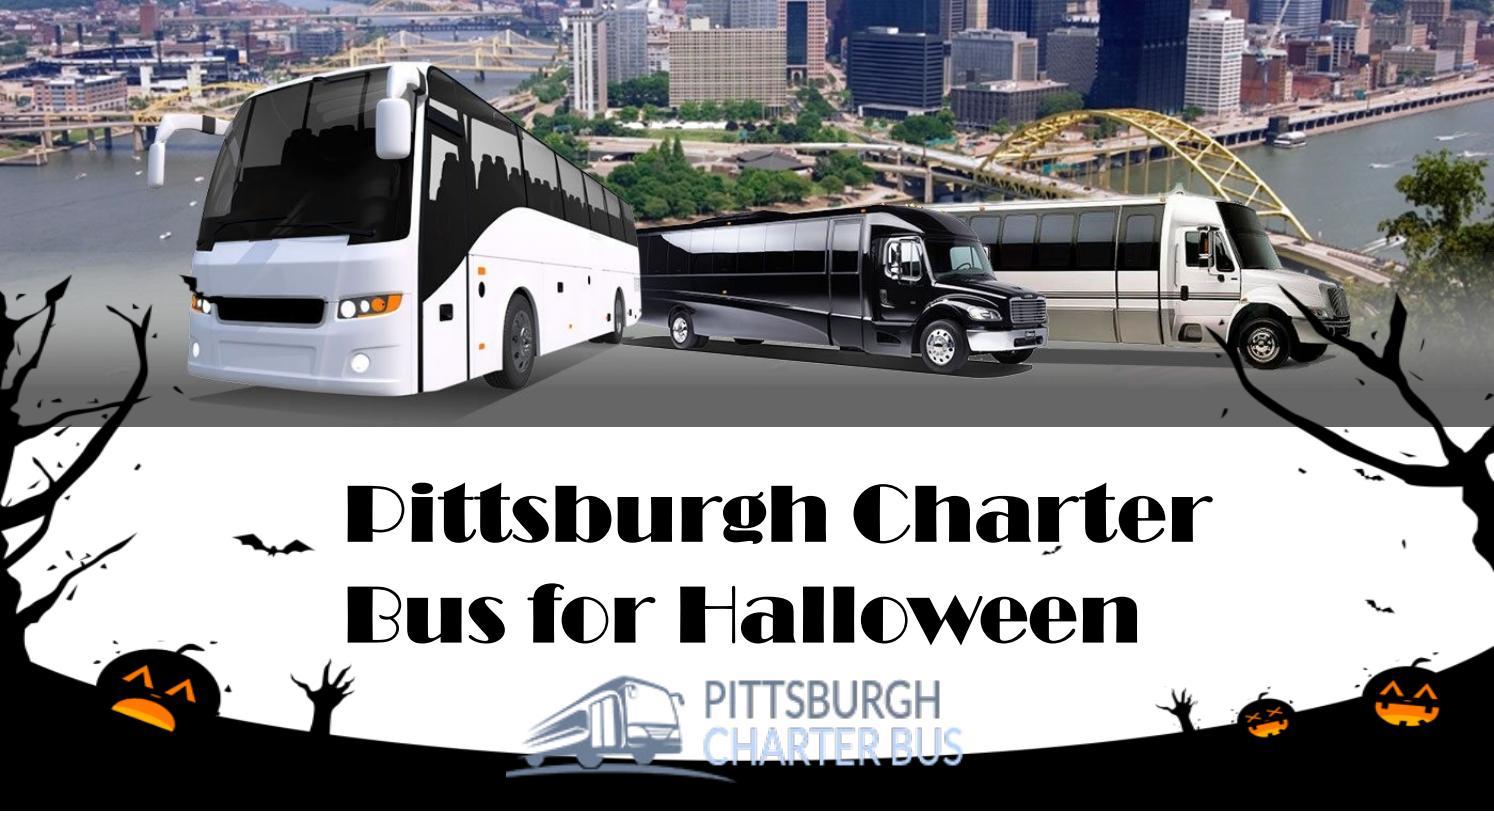 pittsburgh charter bus for halloweencharterbuspittsburgh - issuu